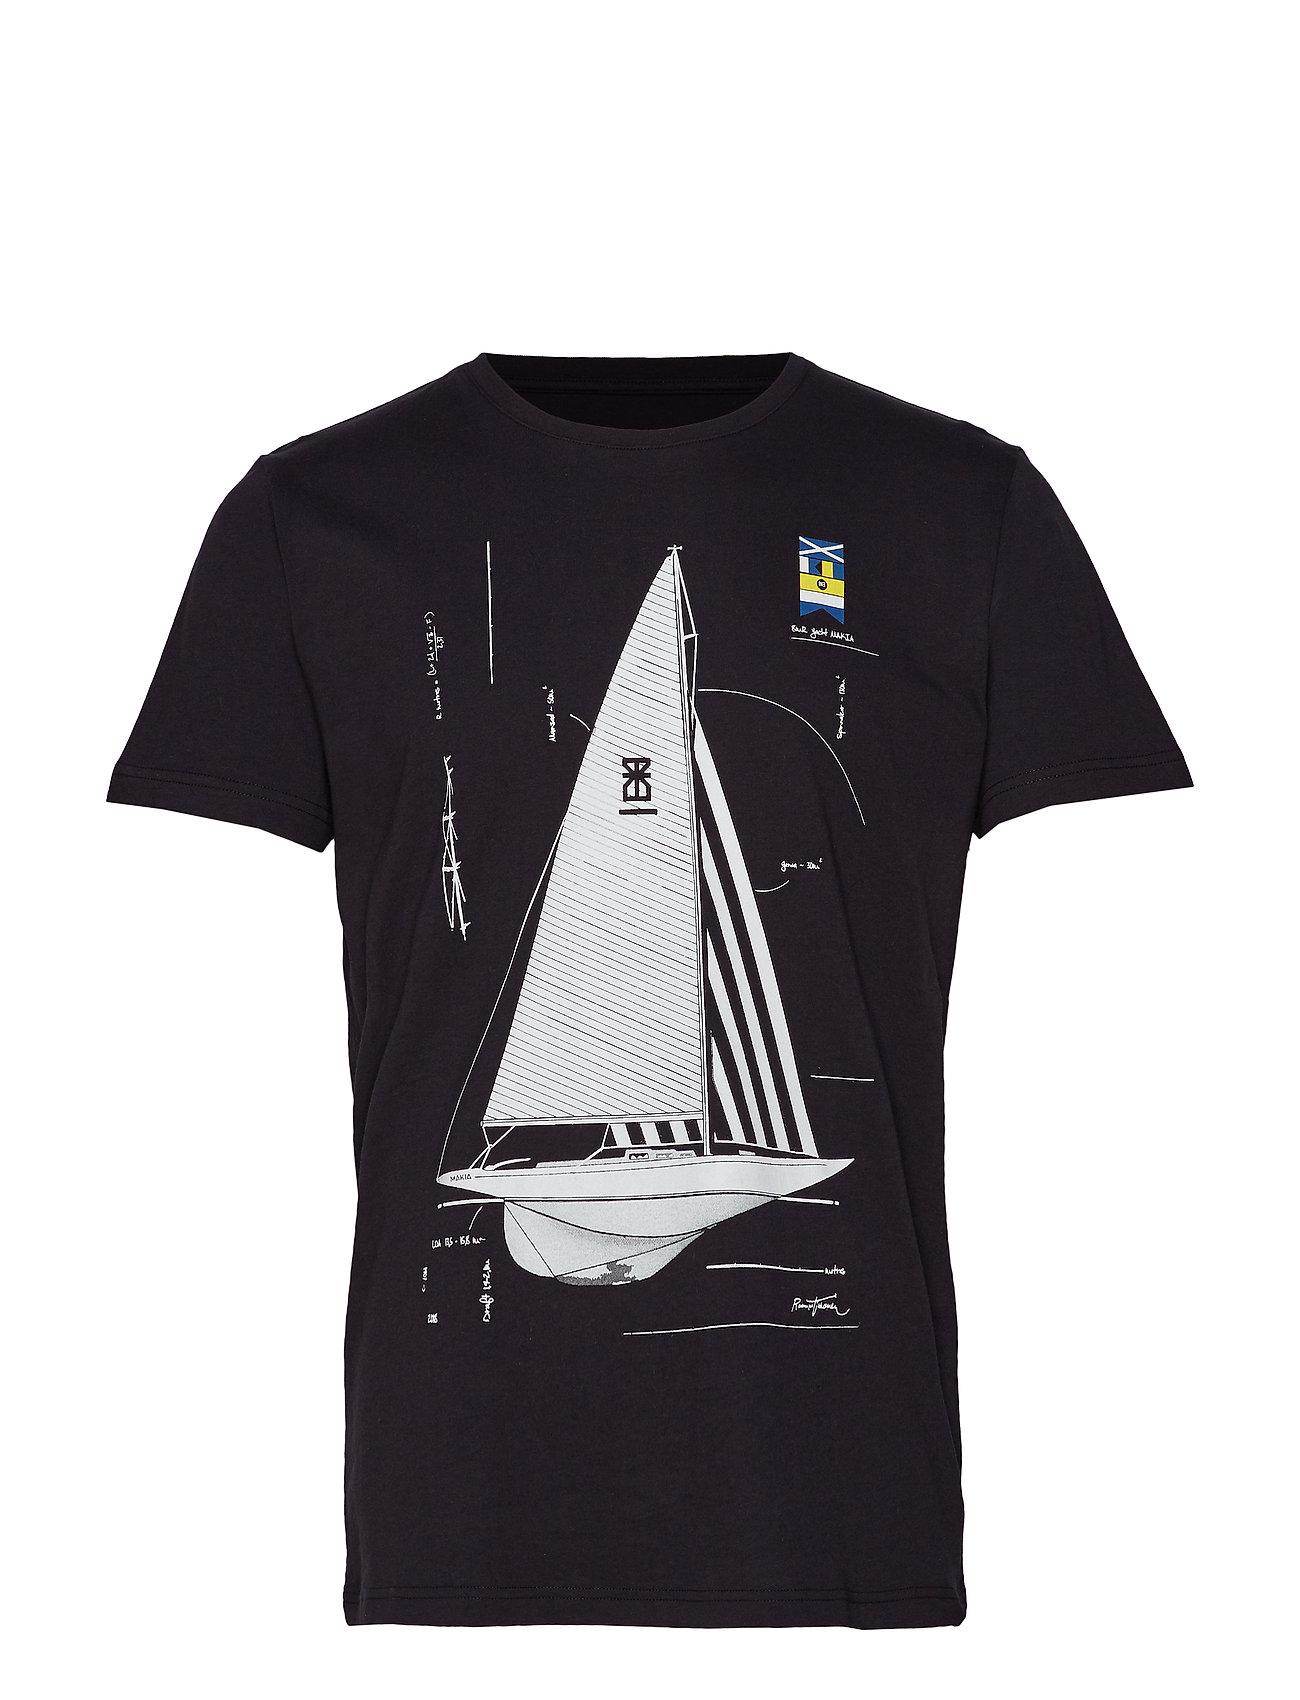 T Genoa shirtblackMakia Genoa shirtblackMakia T Genoa T 4L3ASc5qRj